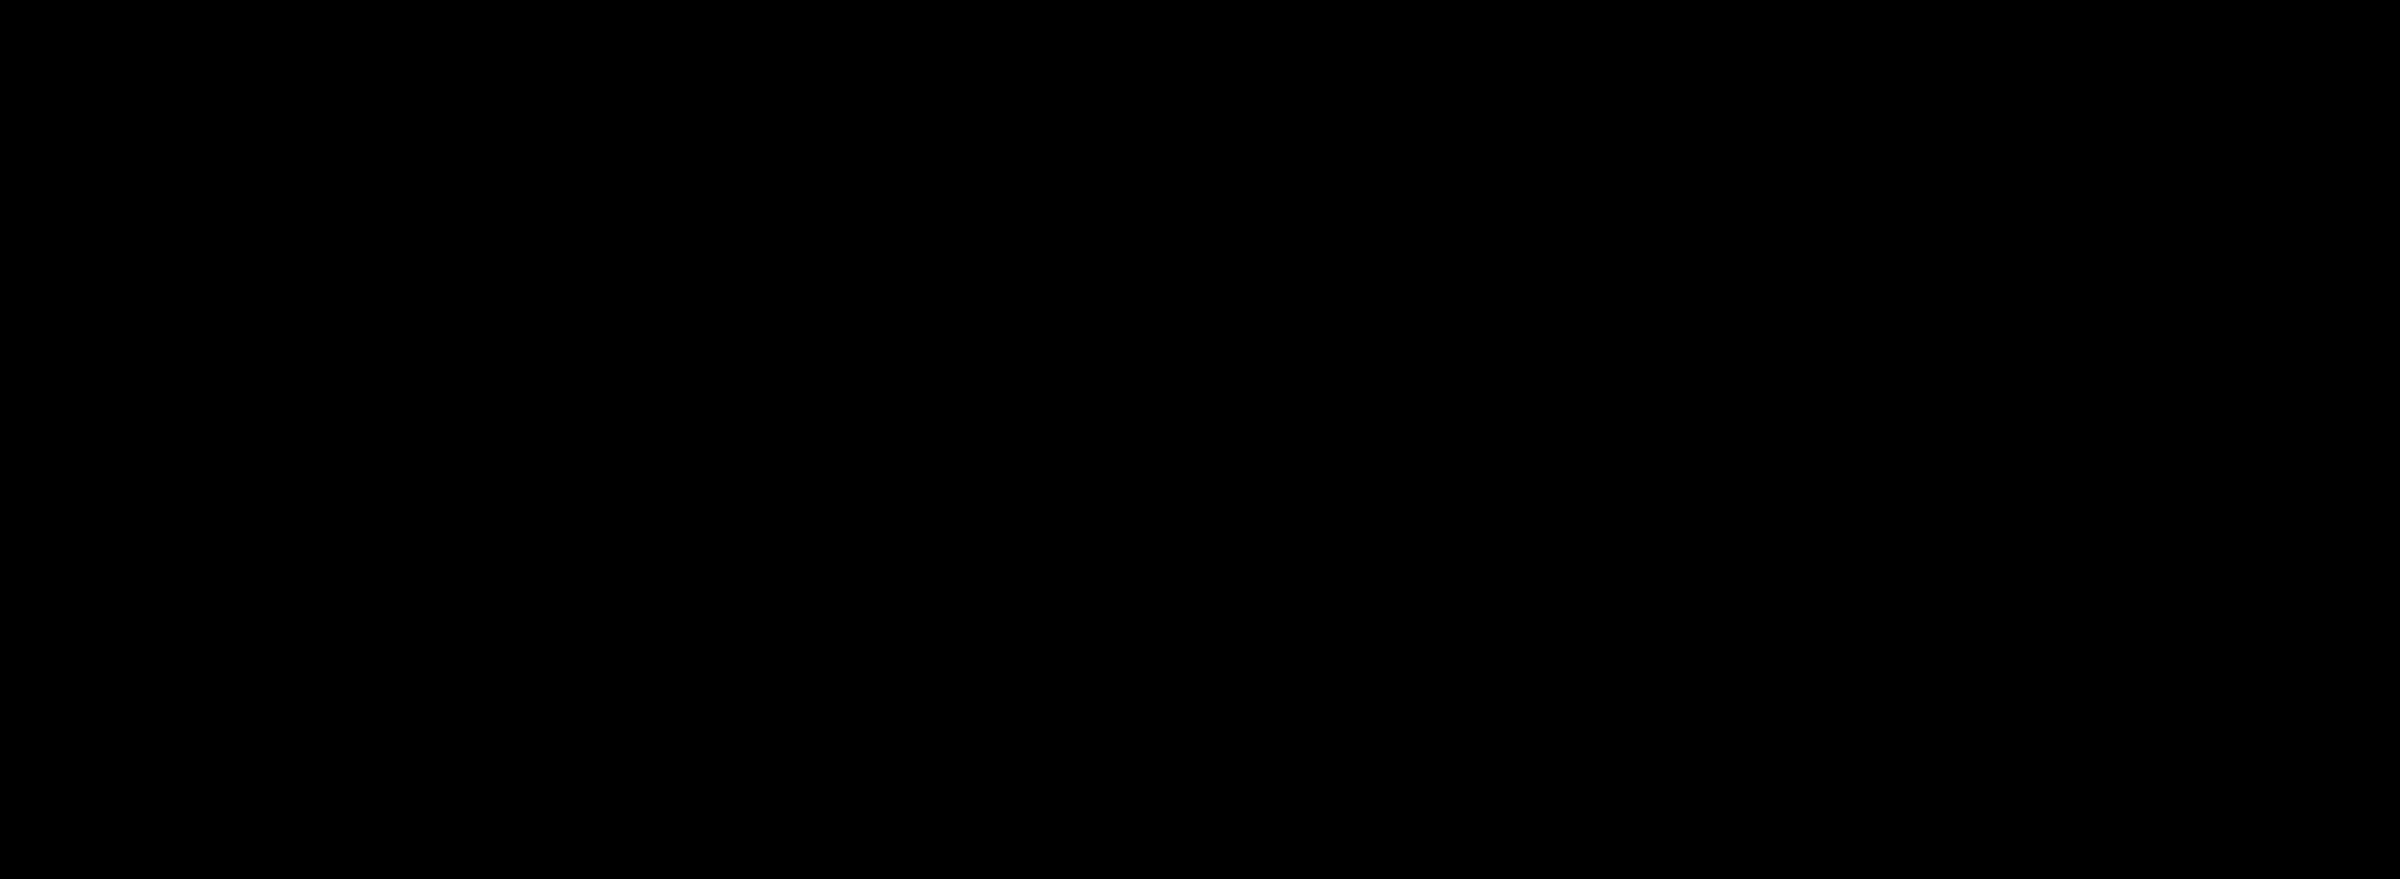 Simple Skeleton Key Clipart-Simple Skeleton Key Clipart-18